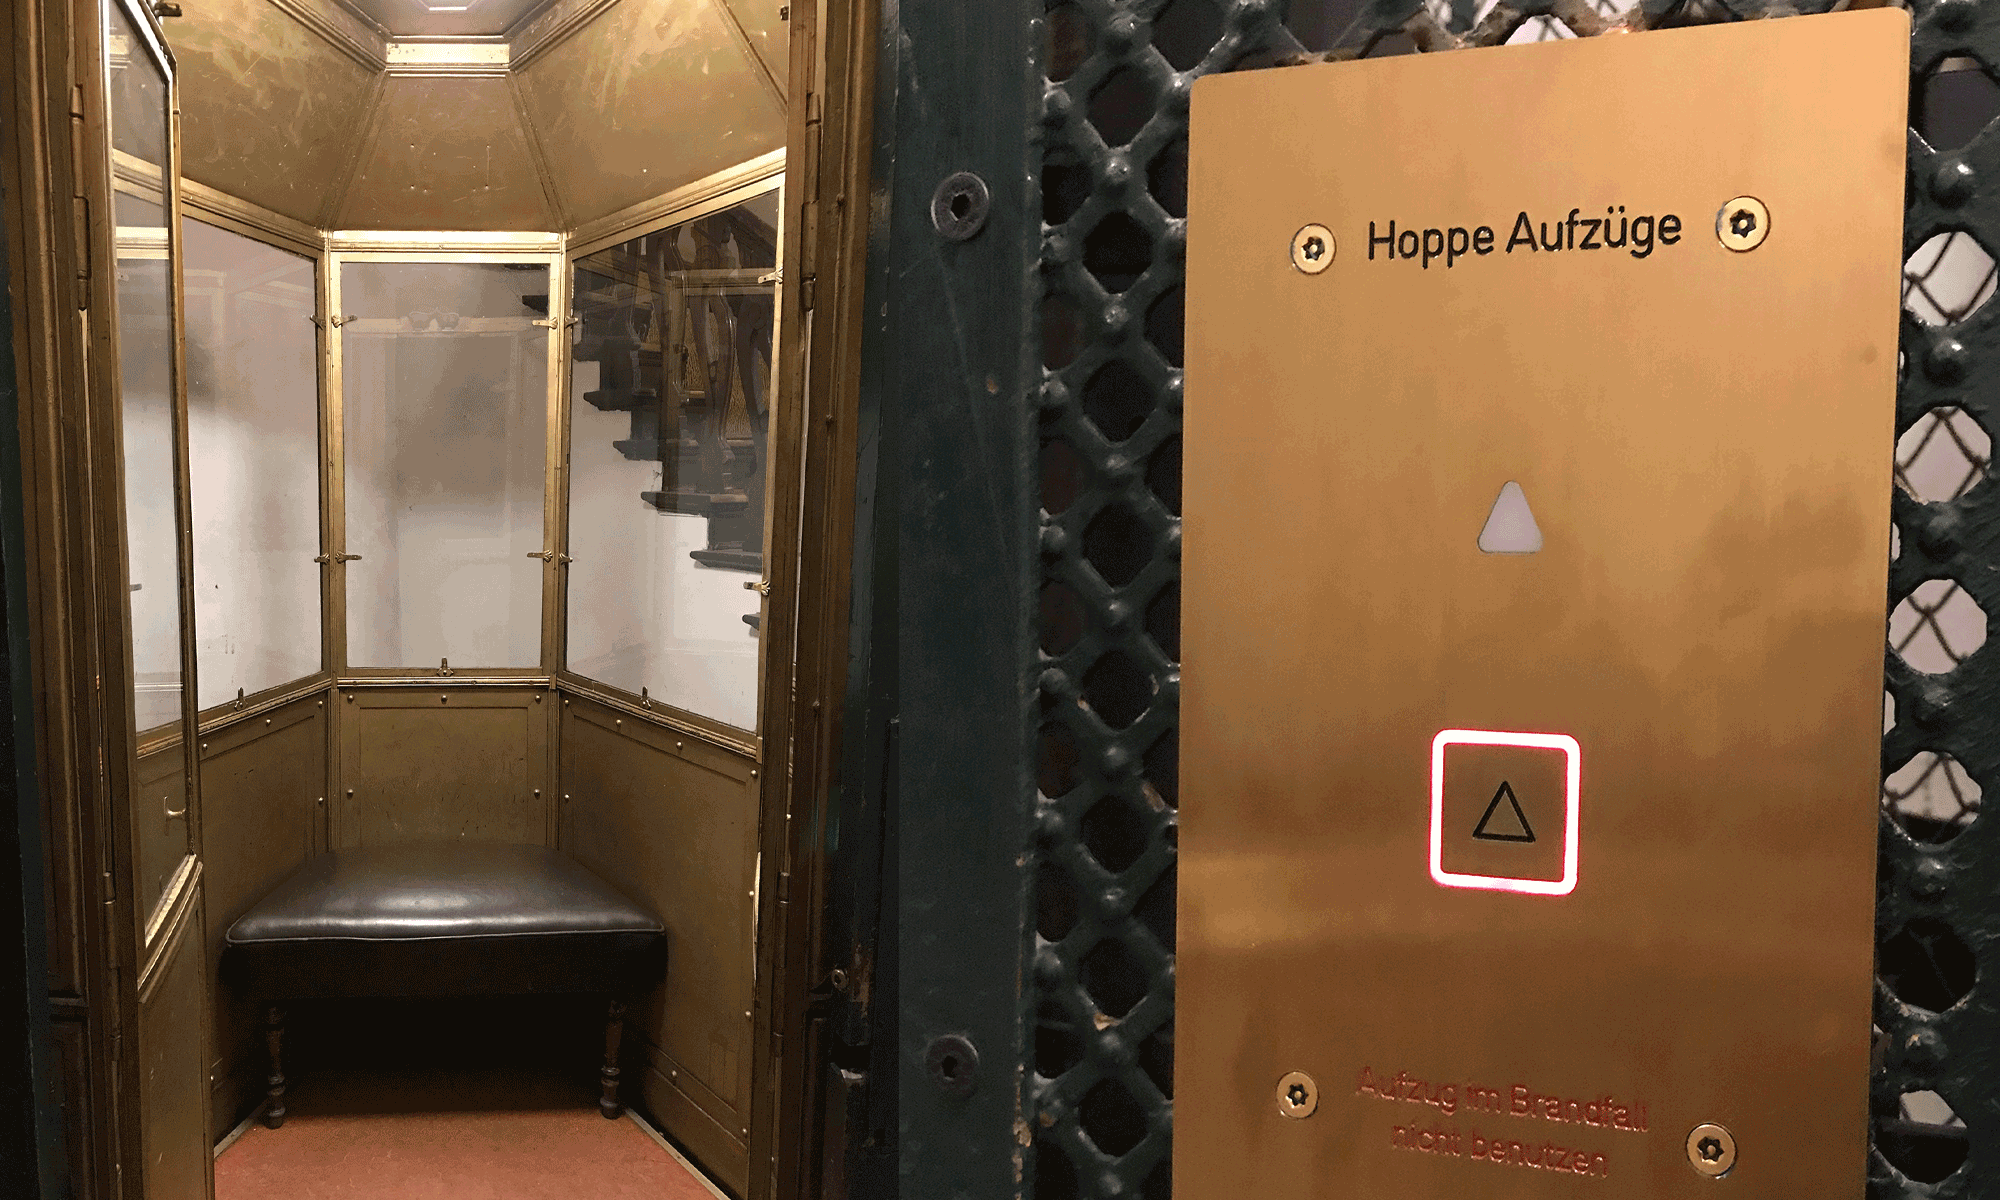 Hoppe Aufzüge & Elektromontagen